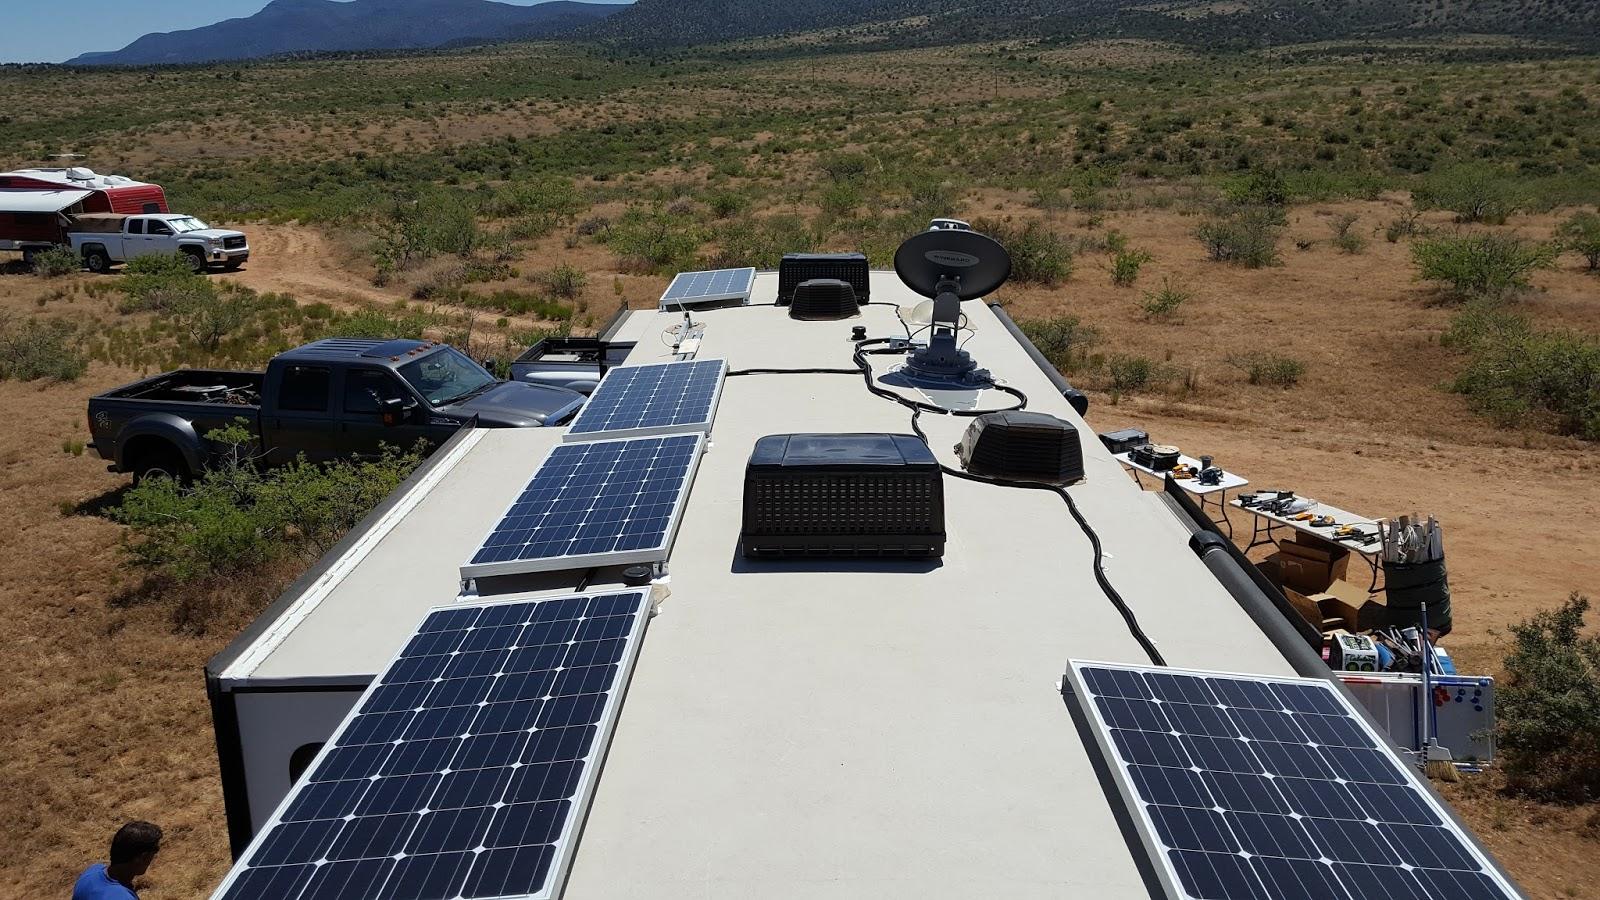 Lift Also Solar Panel Wiring Diagram Besides Rv Solar System Wiring